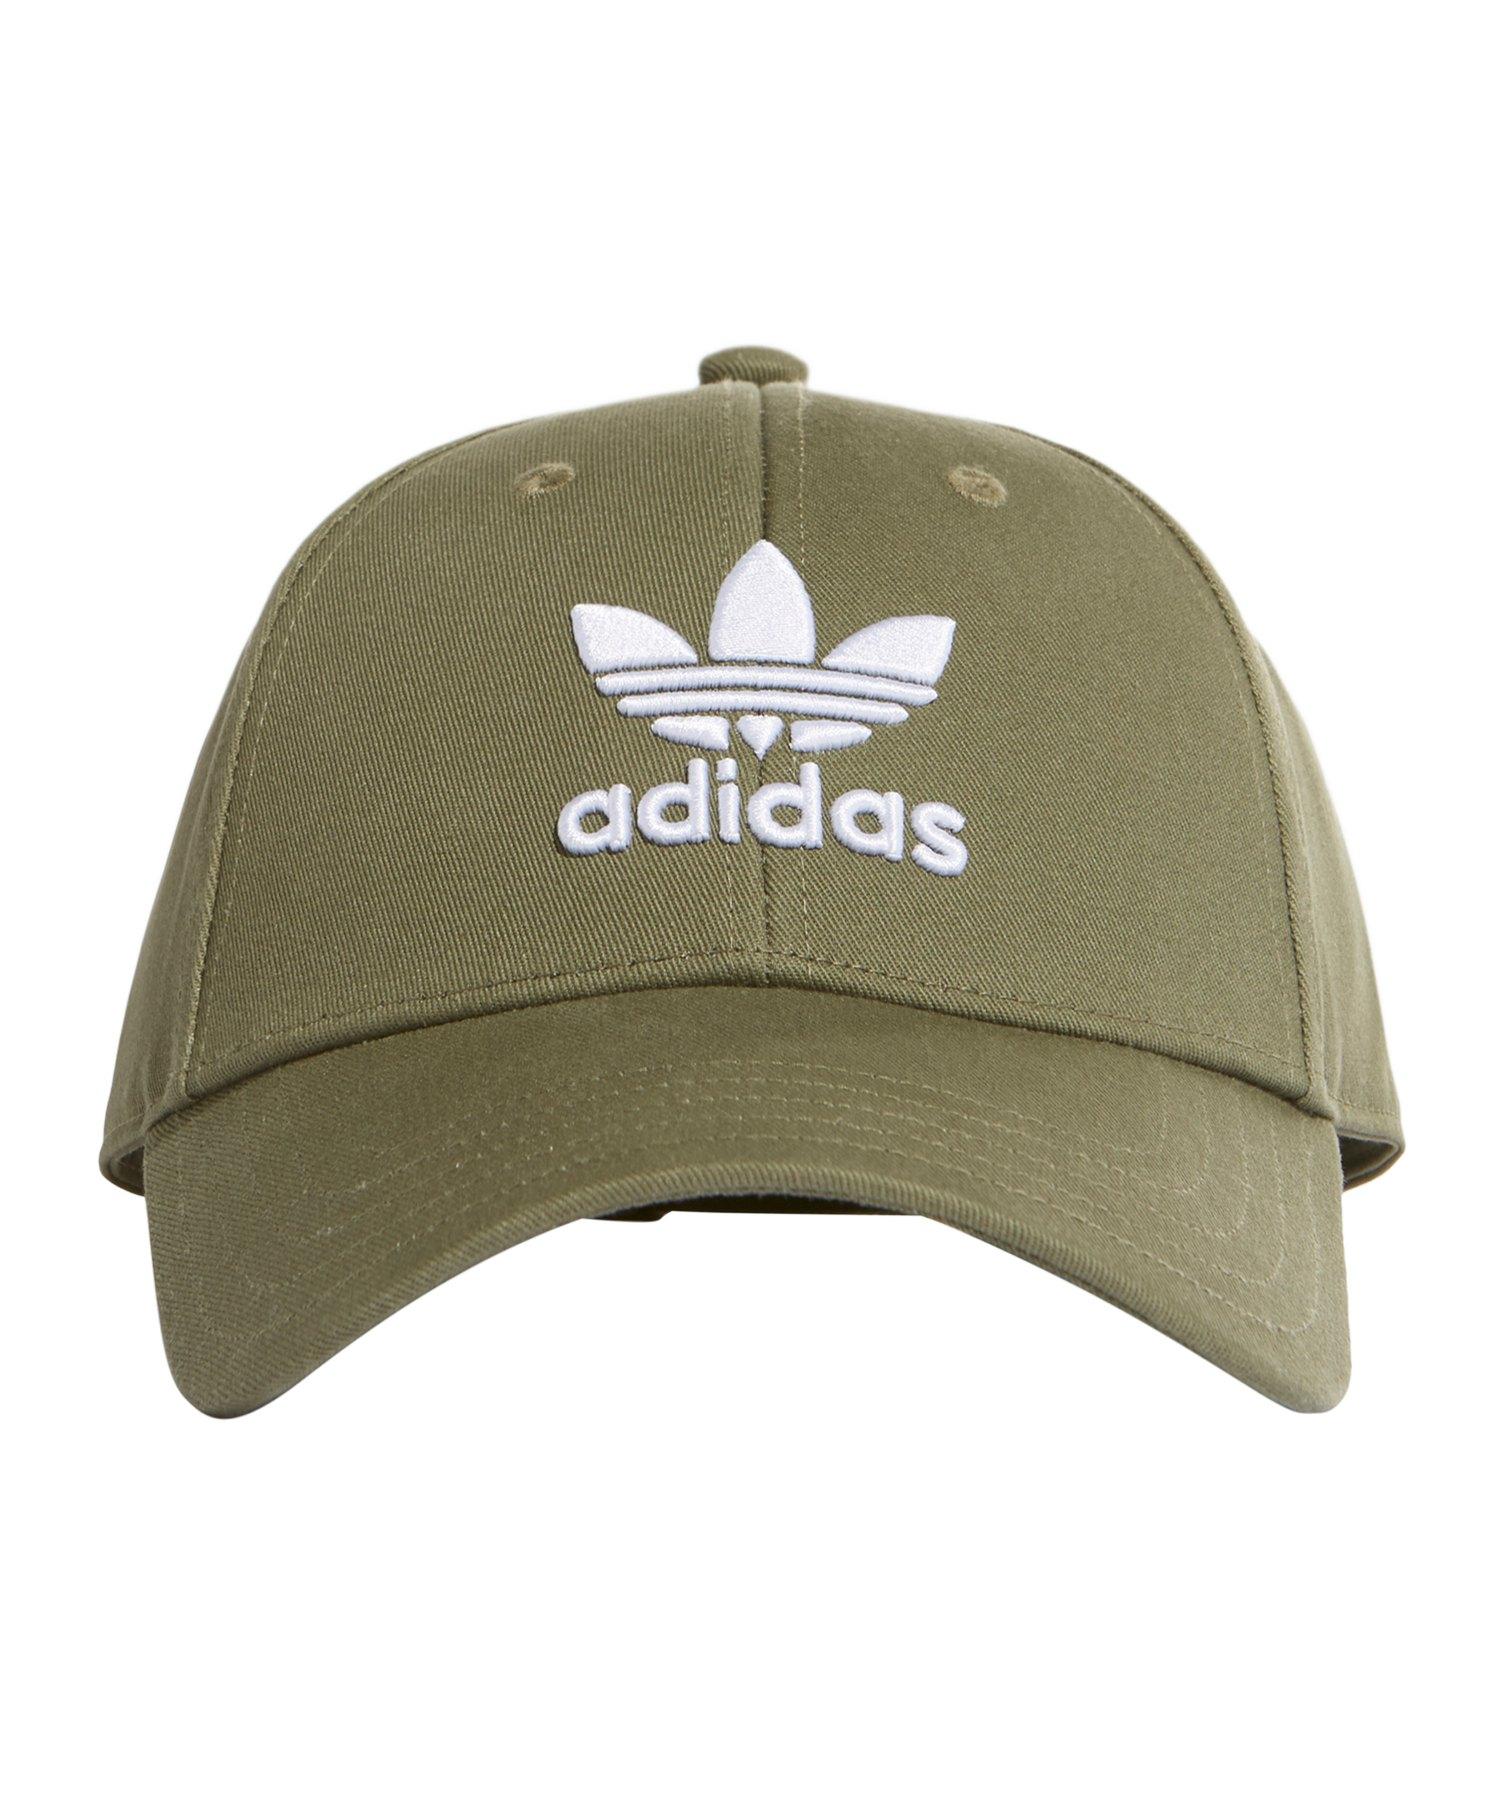 adidas Damen Trefoil Mütze